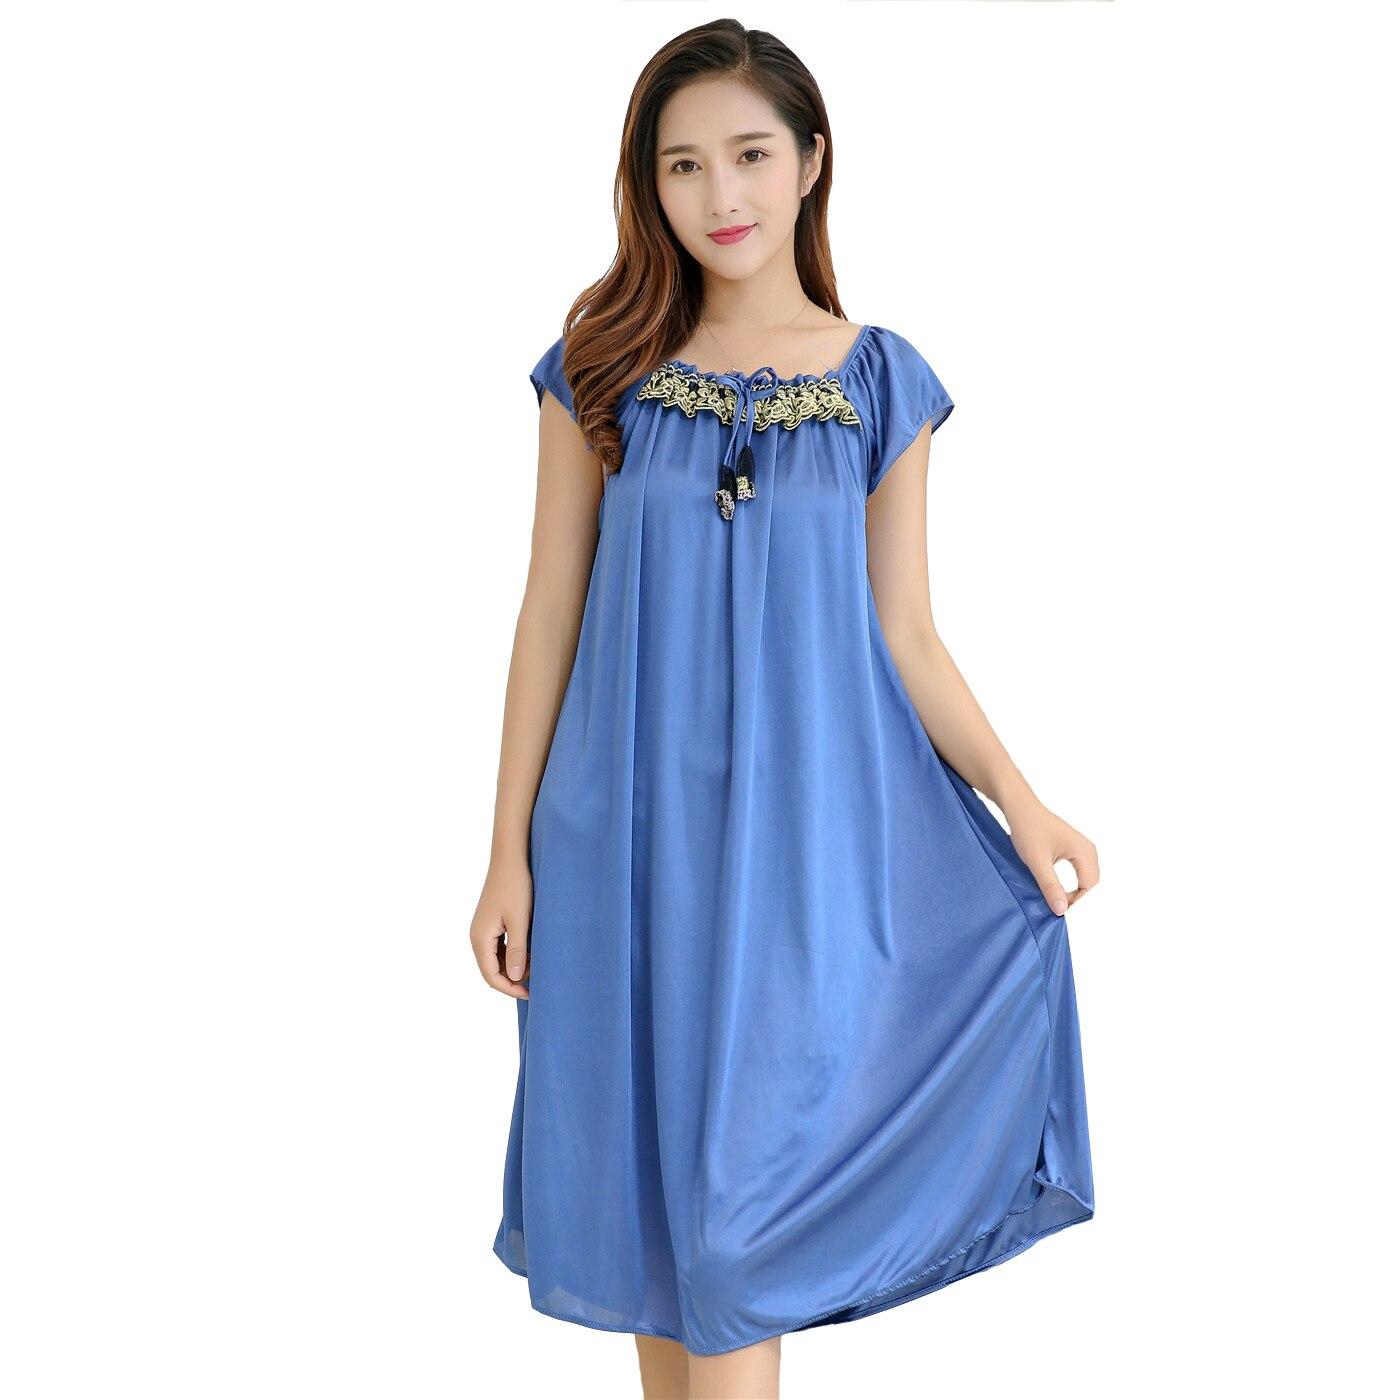 NEW Women Nightdress Summer Casual Sleepwear Satin Nightwear Embroidery Home Dress Female   Nightgown   Sexy   Sleepshirt   Negligee